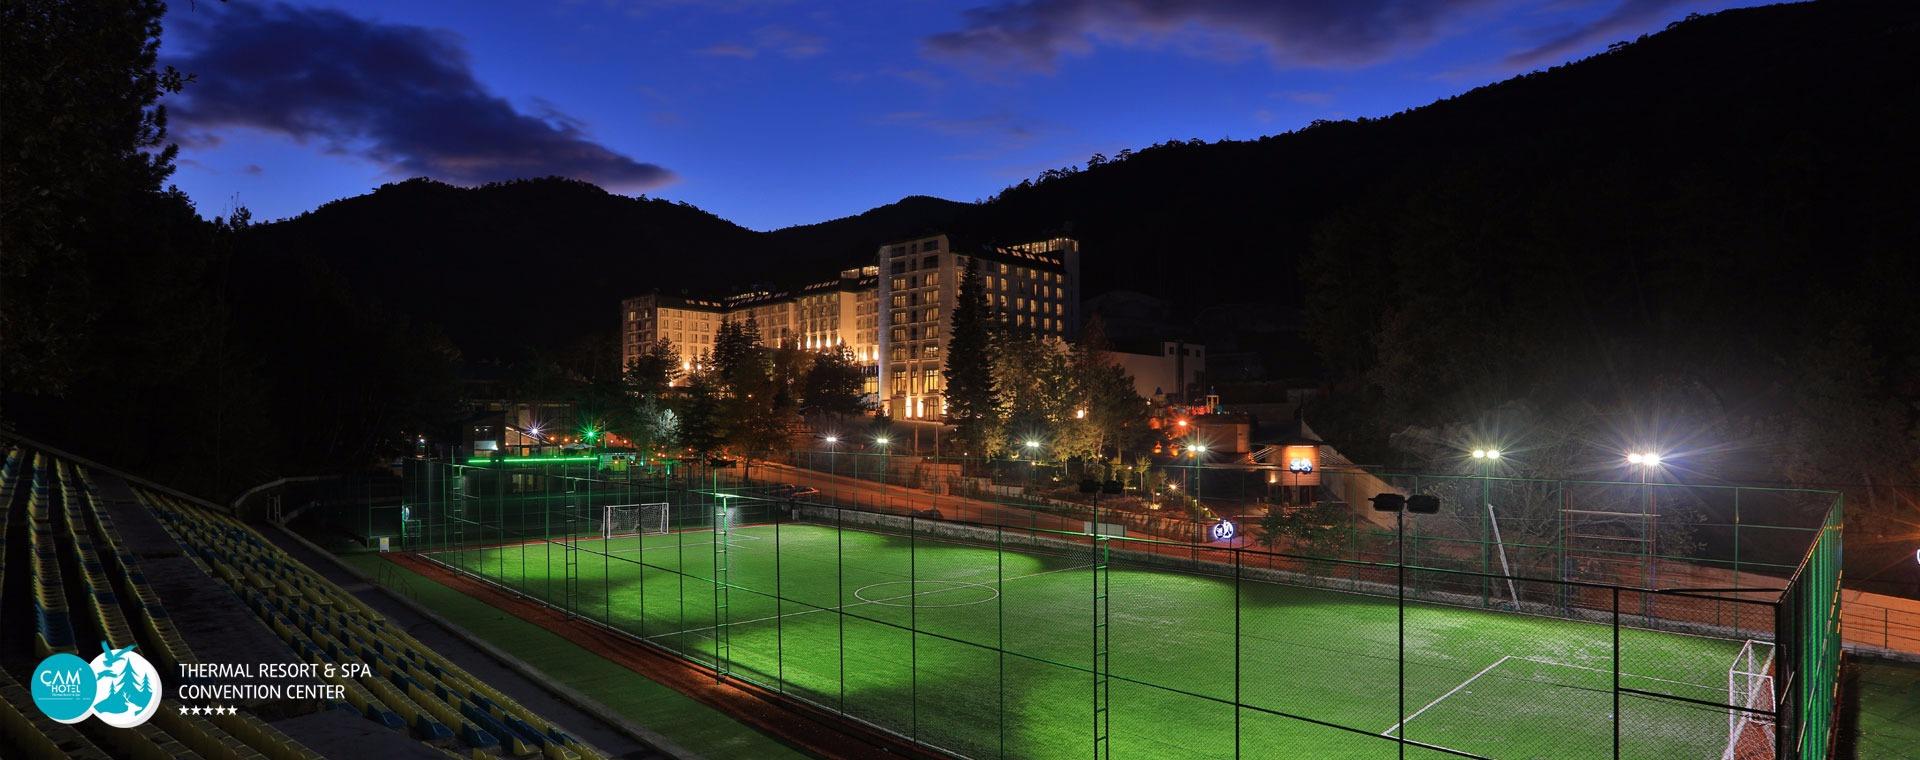 ÇAM HOTEL TERMAL RESORT&SPA46319